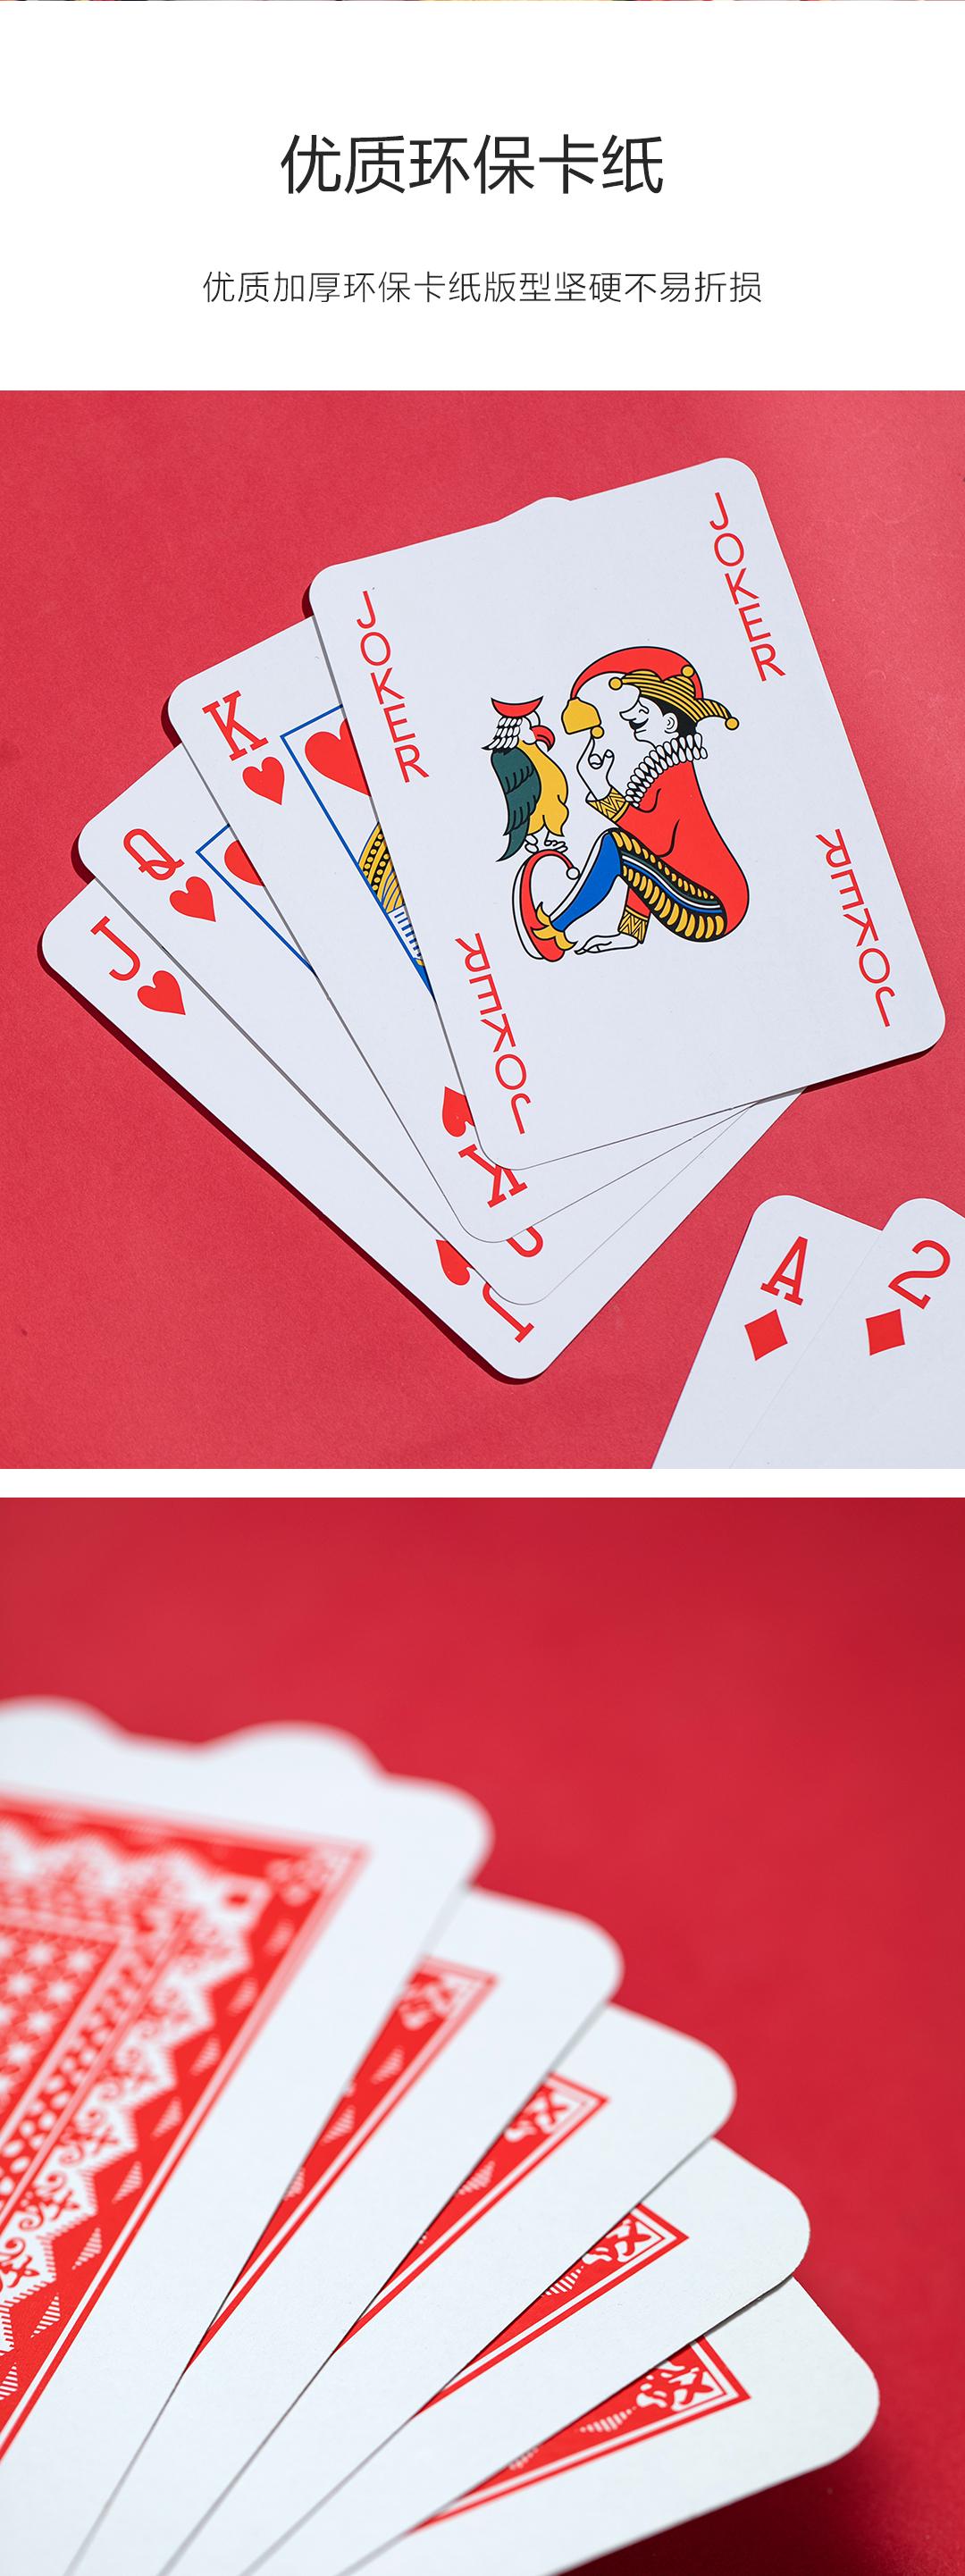 A4超大扑克牌堵门游戏道具